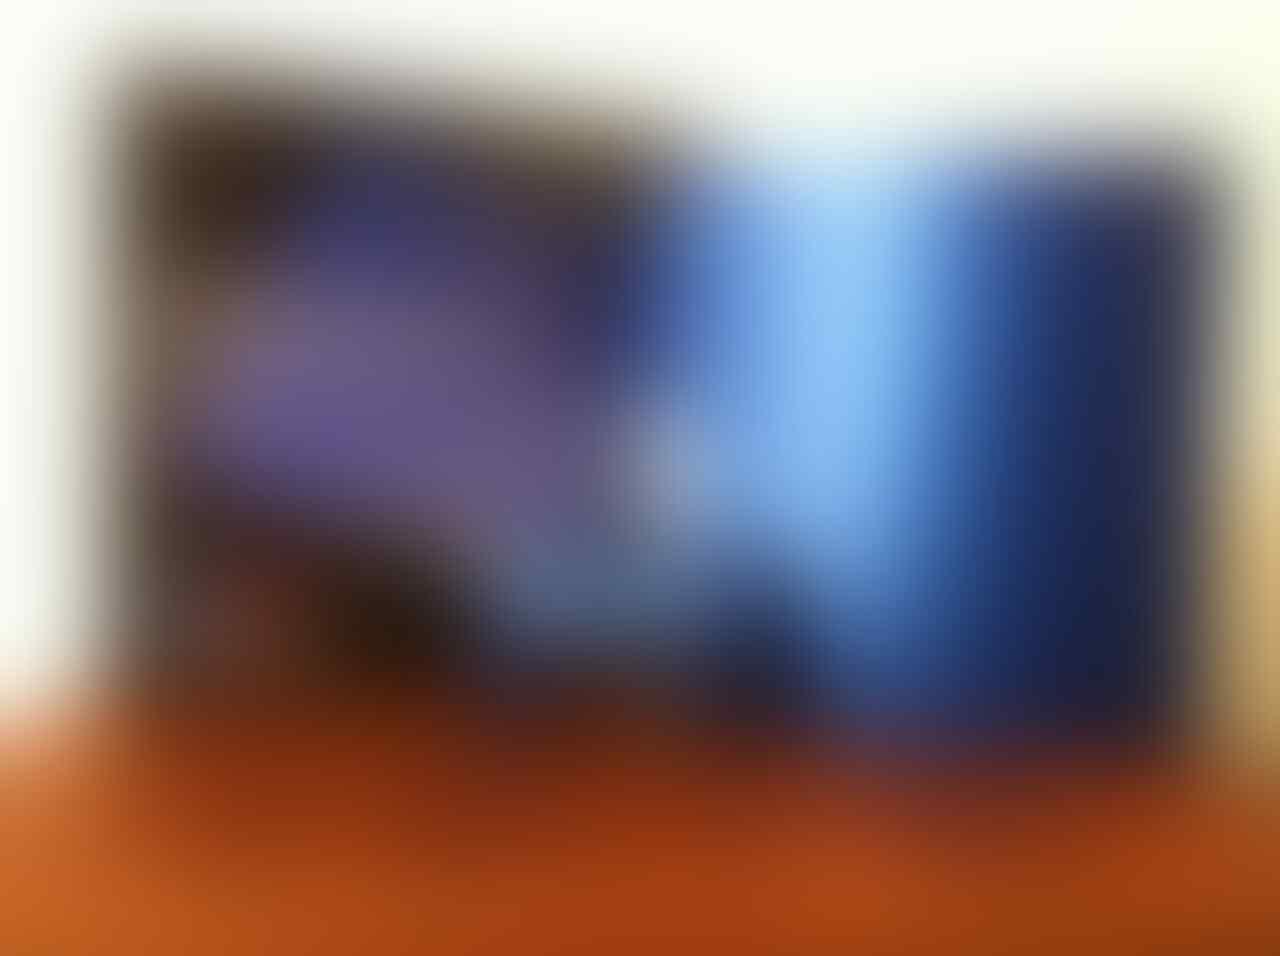 PS3 SLIM 120-320GB Cfw Second & New - Stok Banyak - Bandung